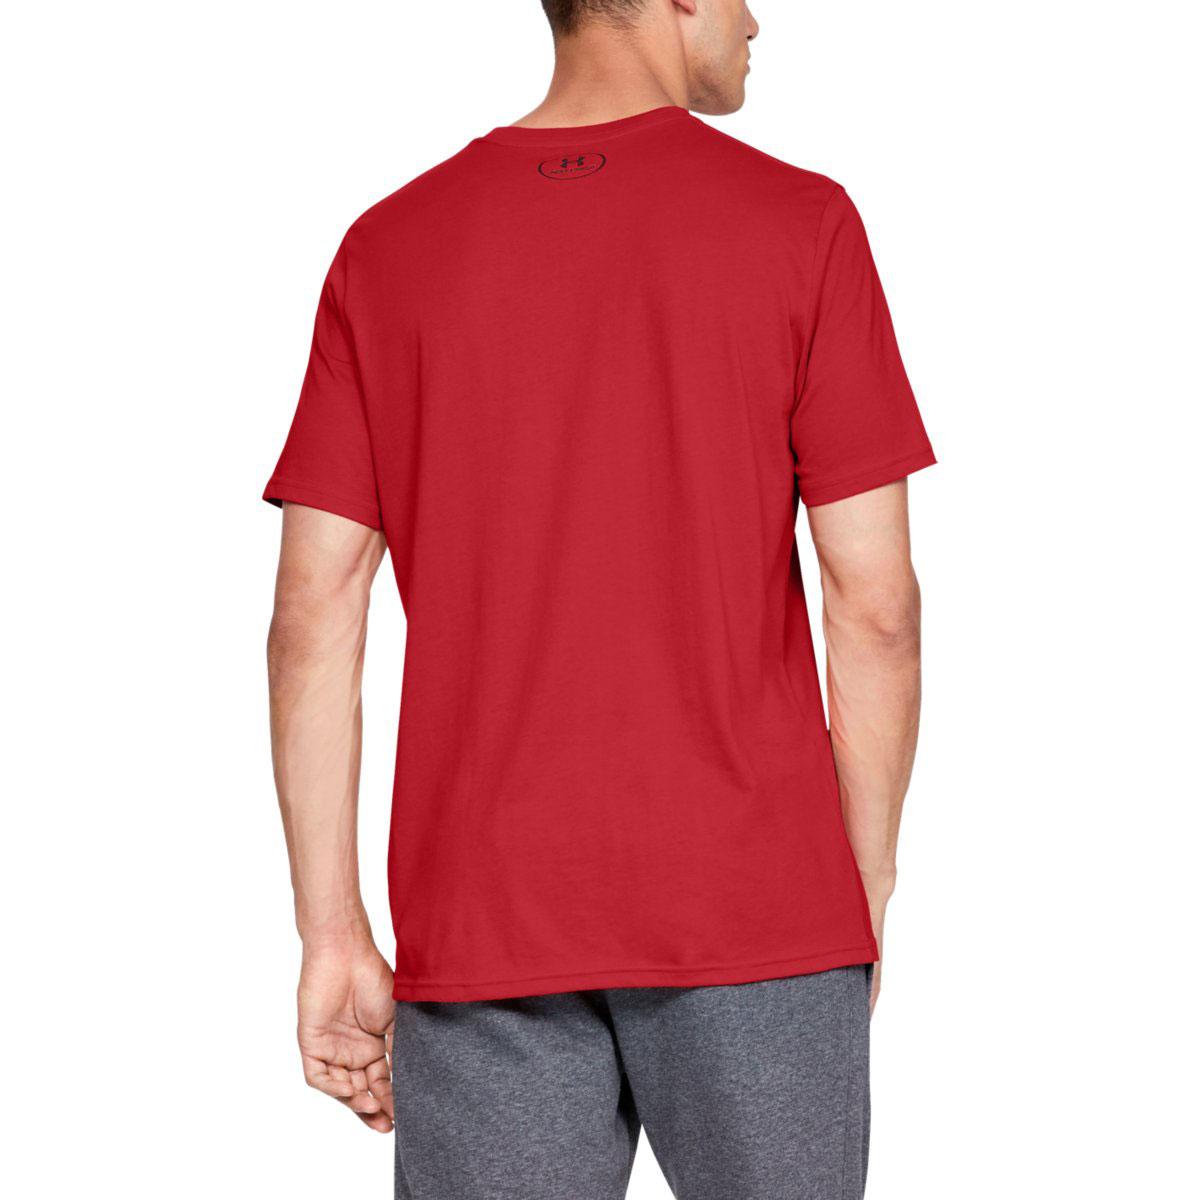 Under-Armour-Mens-2019-UA-Boxed-Sportstyle-HeatGear-Training-Gym-T-Shirt-Tee thumbnail 11